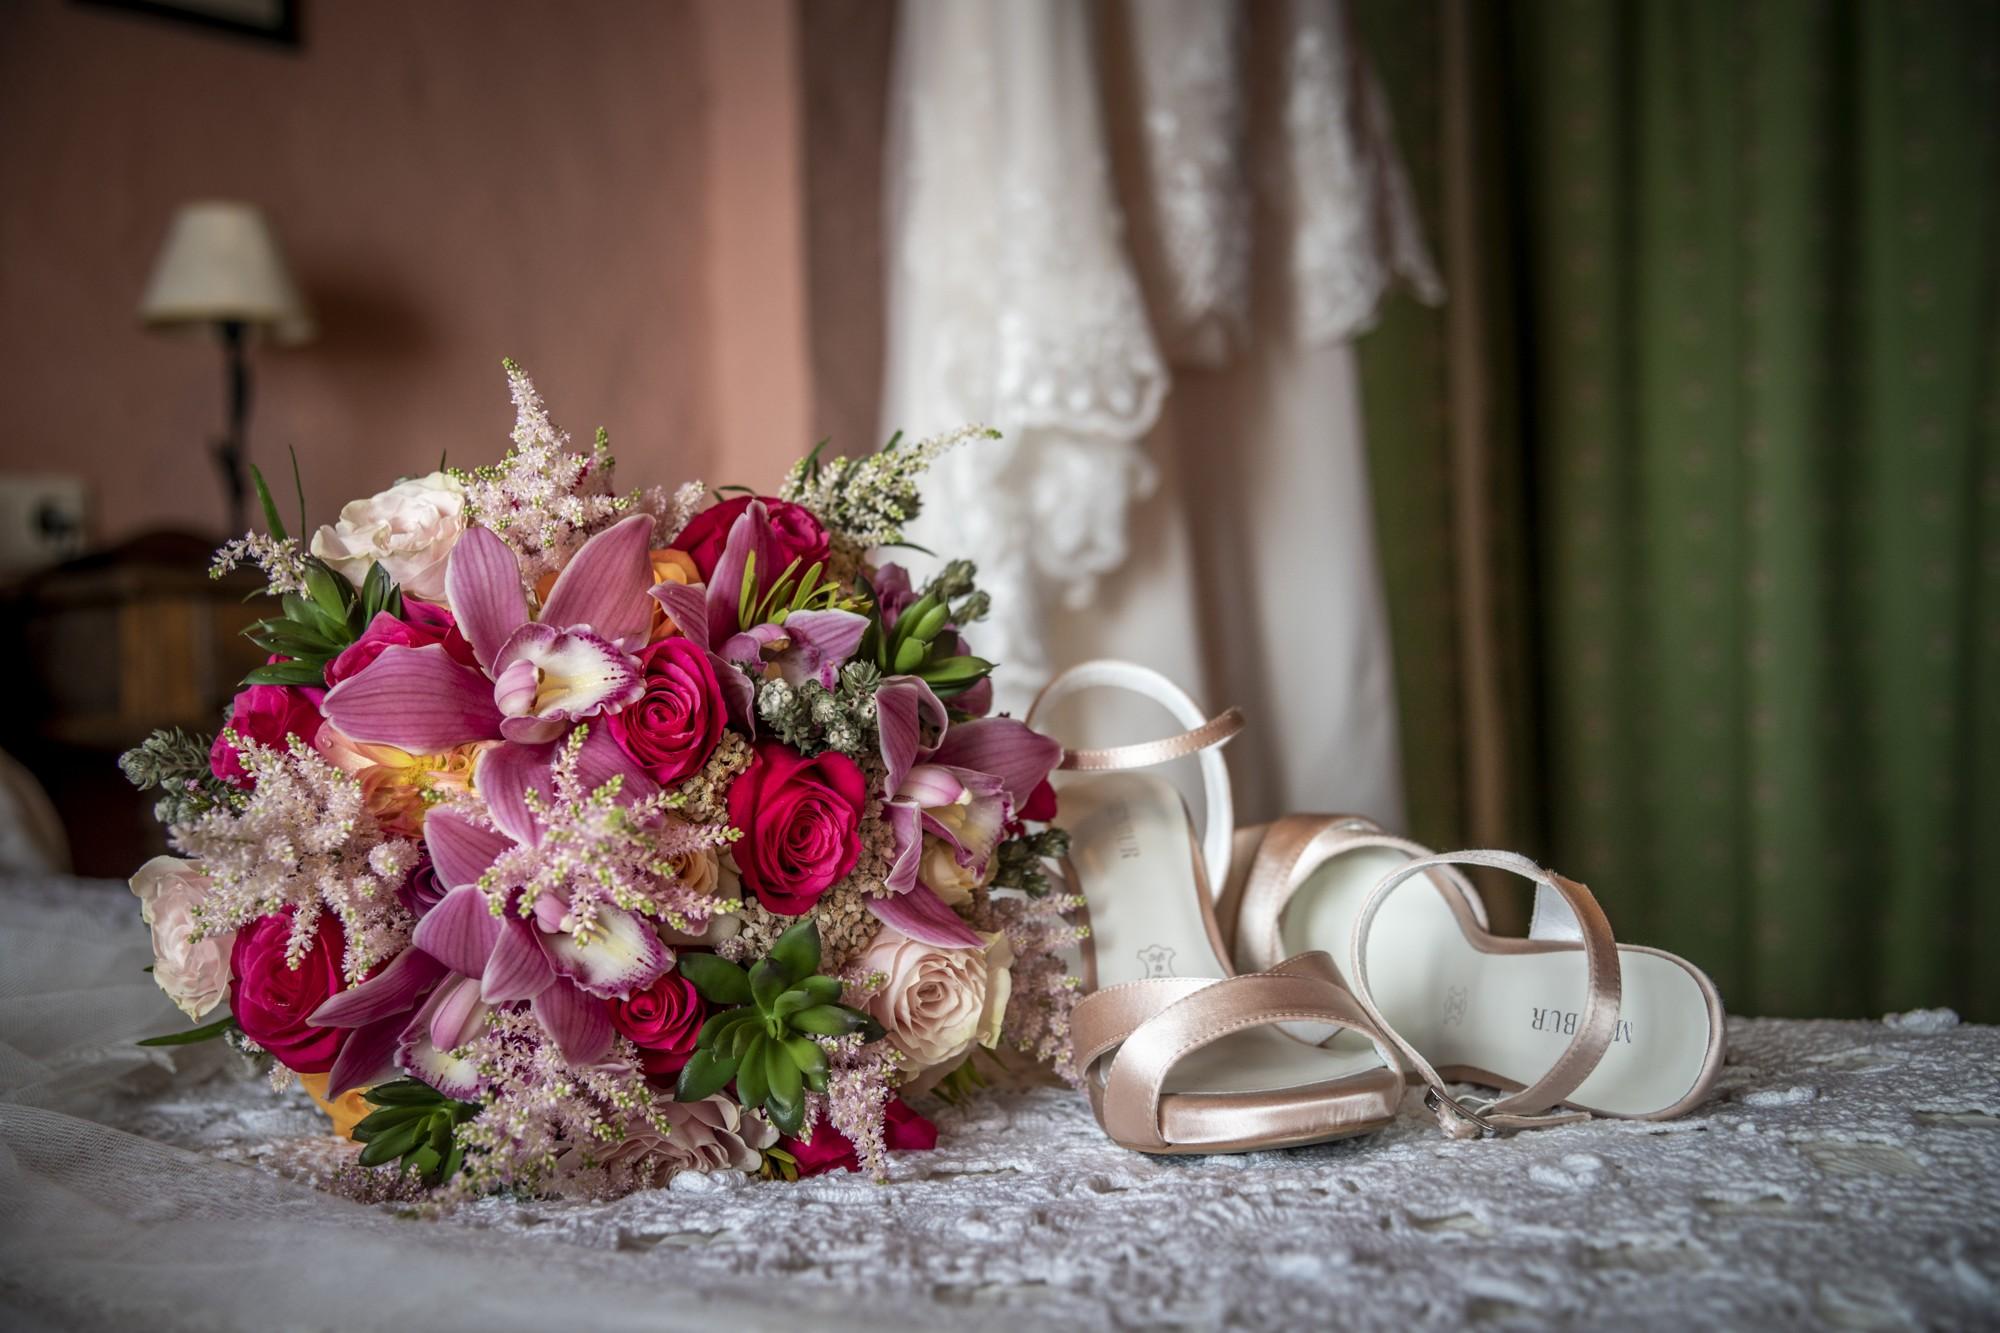 Toni Bazan Fotografía. Consejos para elegir tu ramo de novia